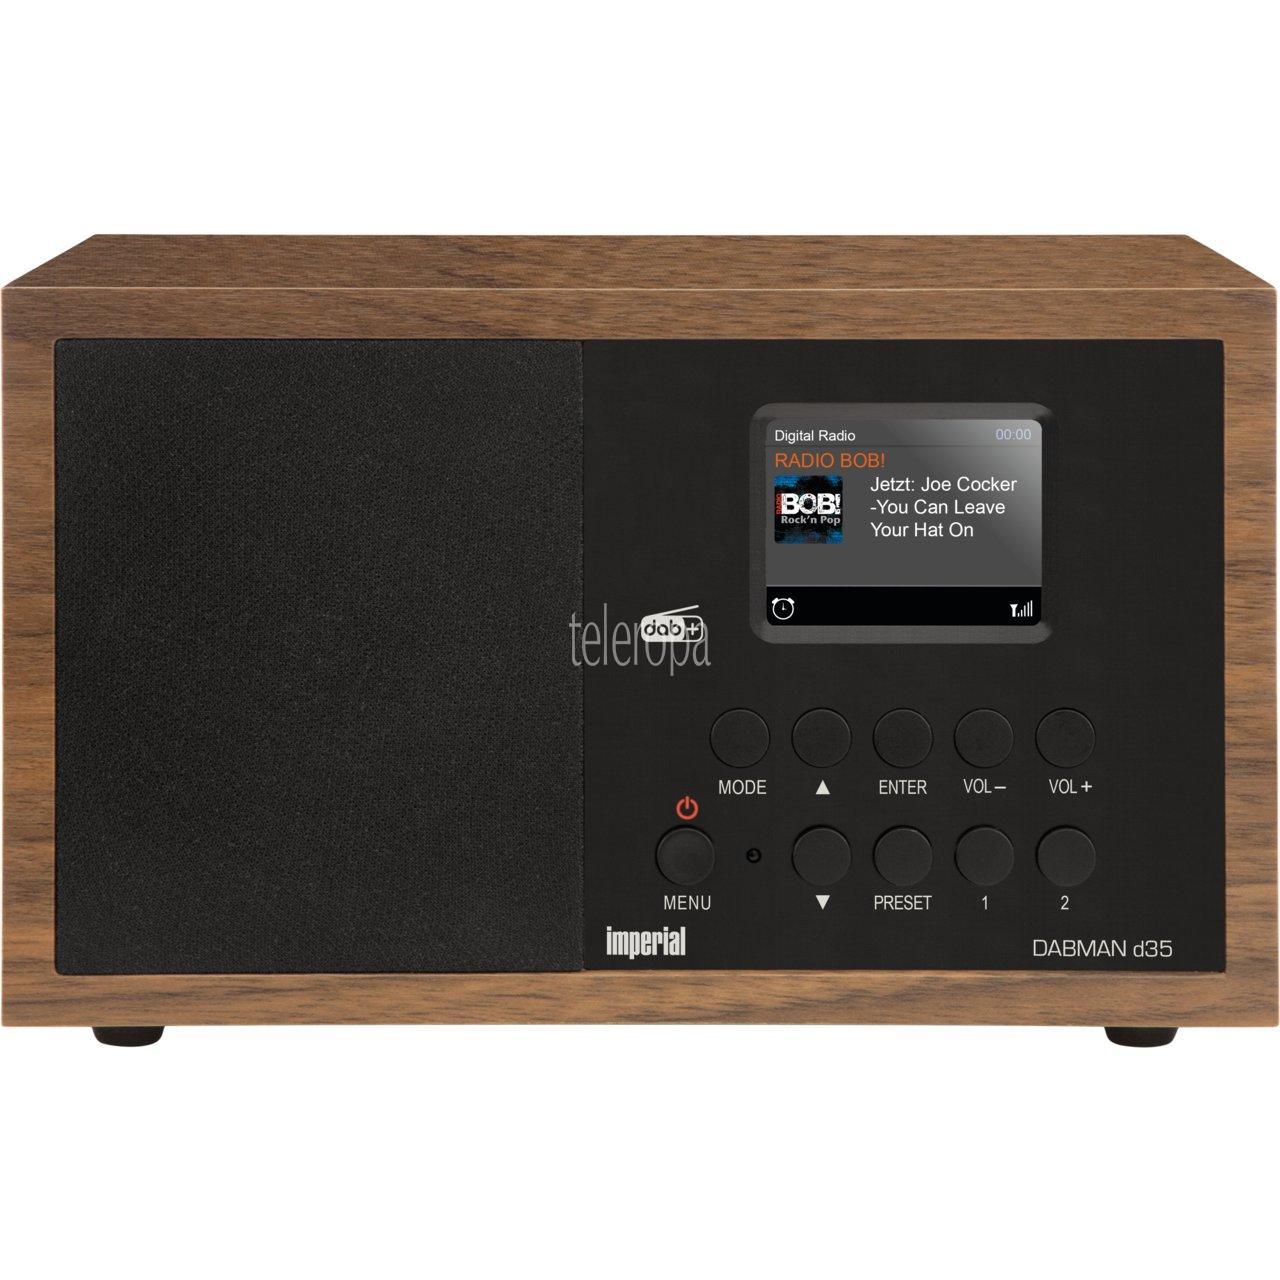 imperial dabman d 35 bt digitalradio mono bluetooth 3 0. Black Bedroom Furniture Sets. Home Design Ideas